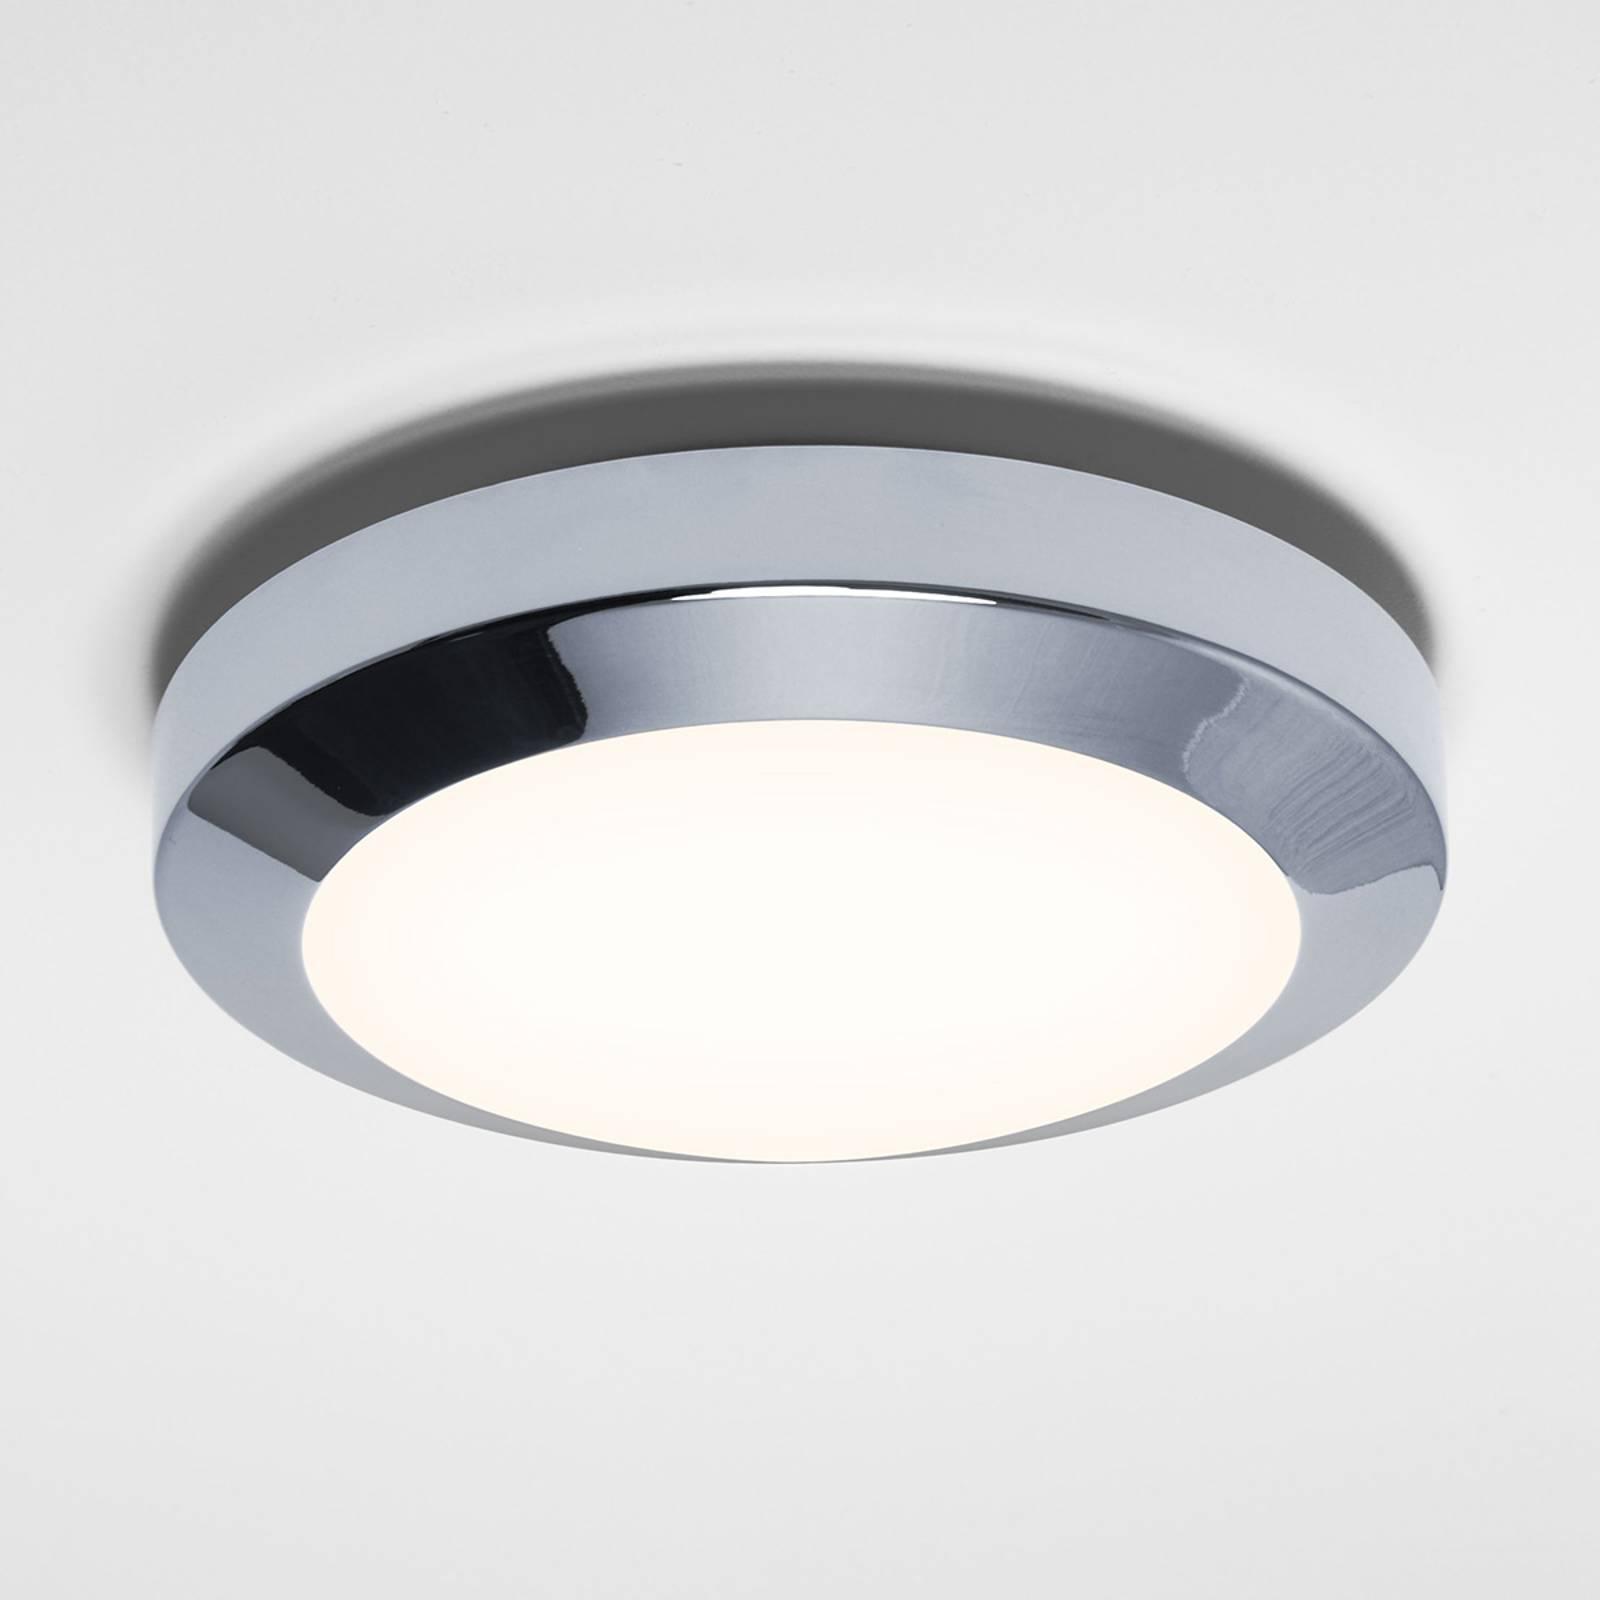 Astro Dakota 180 lampa sufitowa chrom, Ø 18 cm